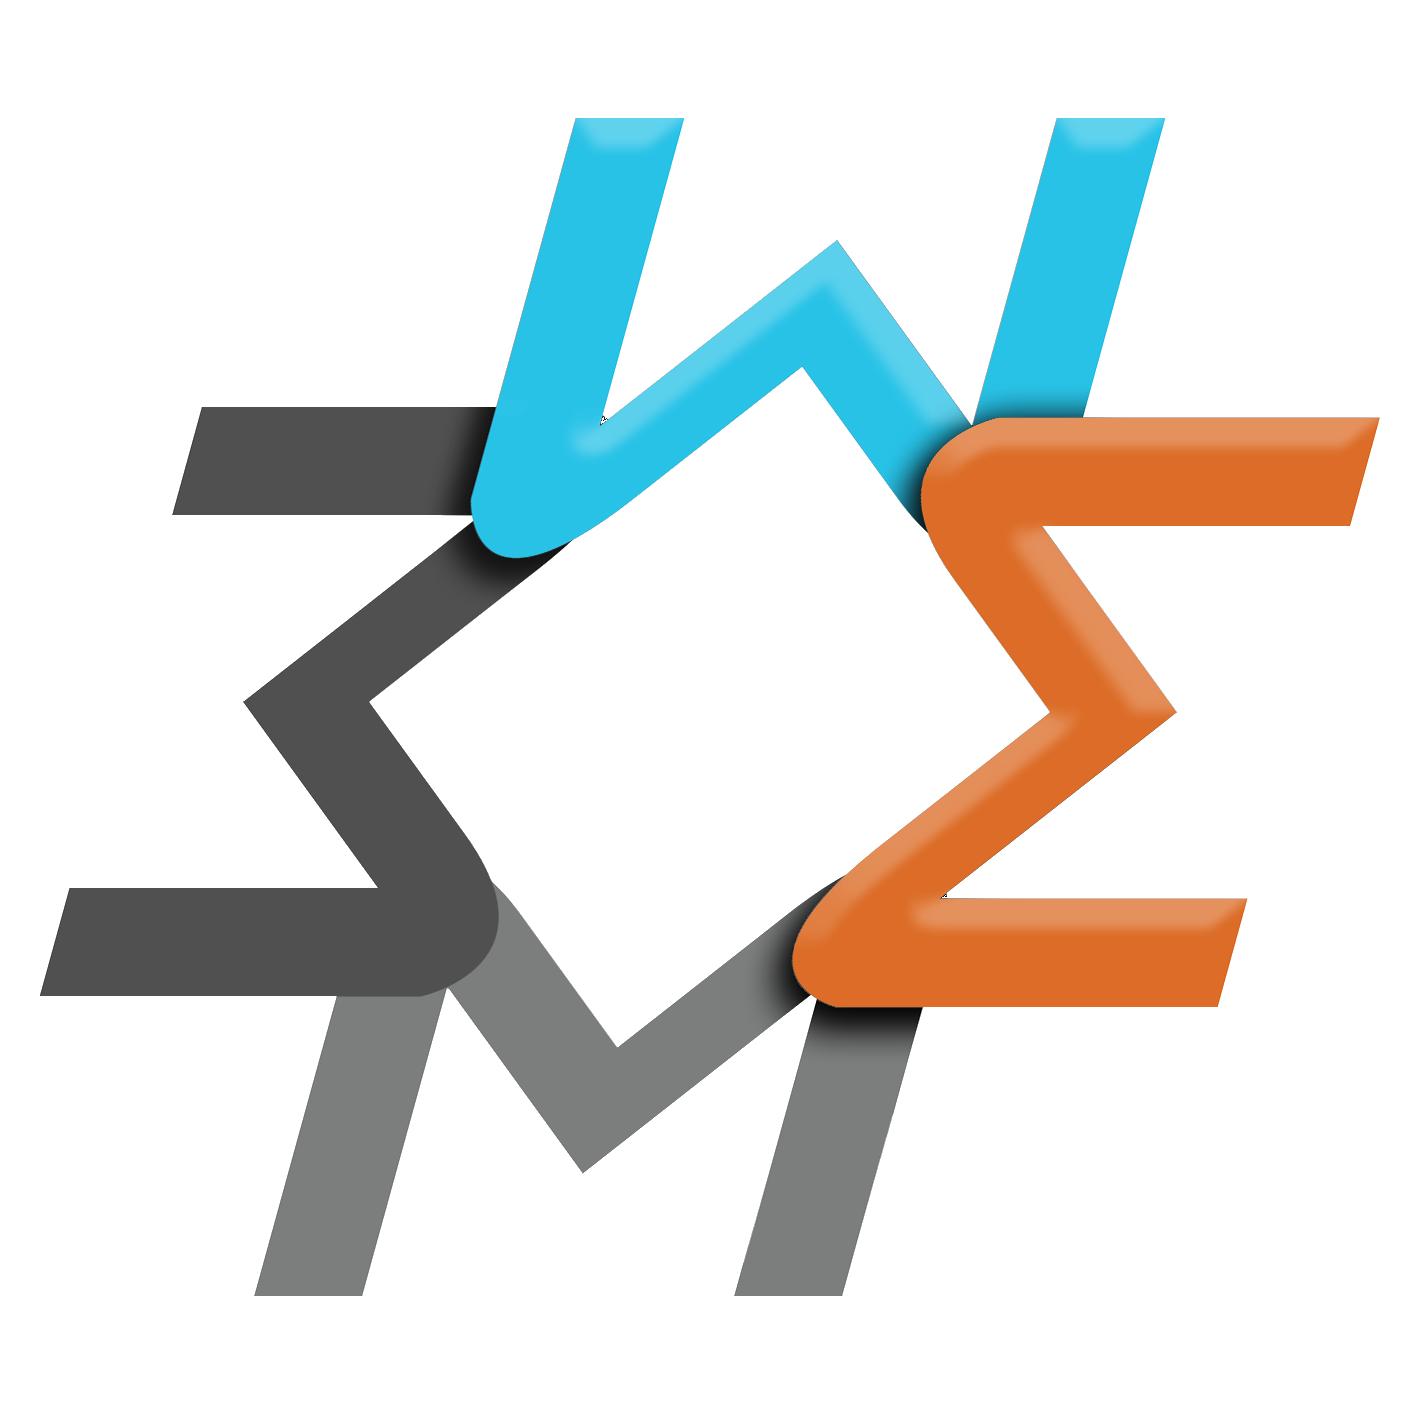 Template web flexvel para sites de industrial 52075 ben ccuart Gallery